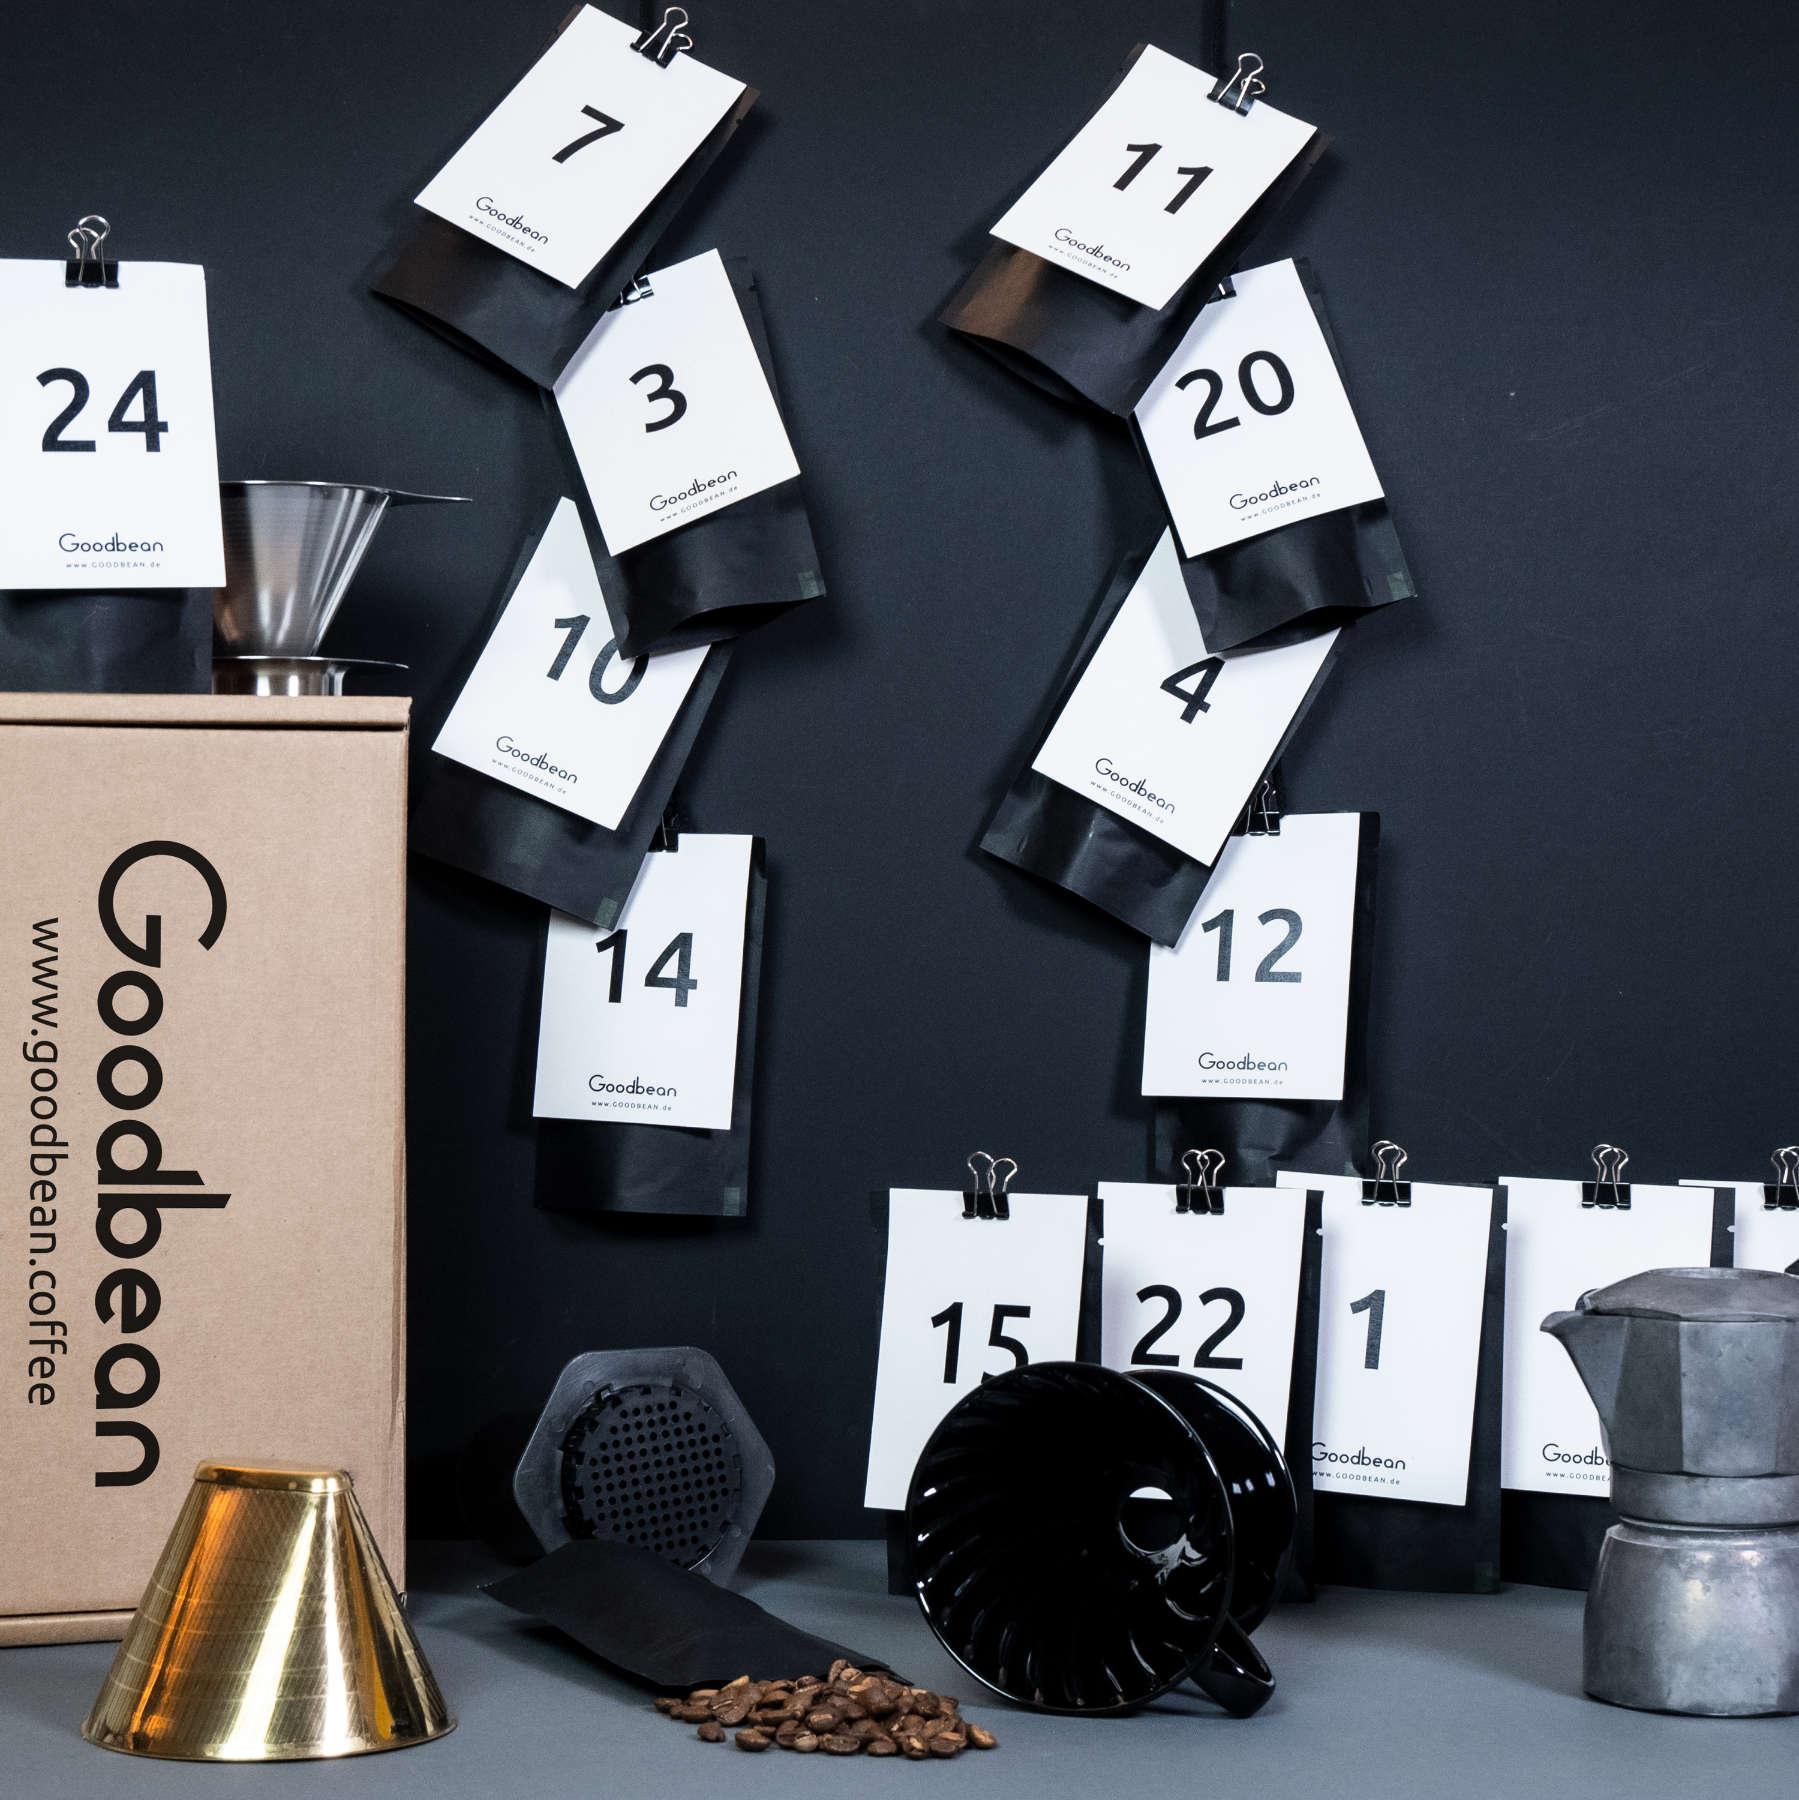 Goodbean Kaffee Adventskalender 2021